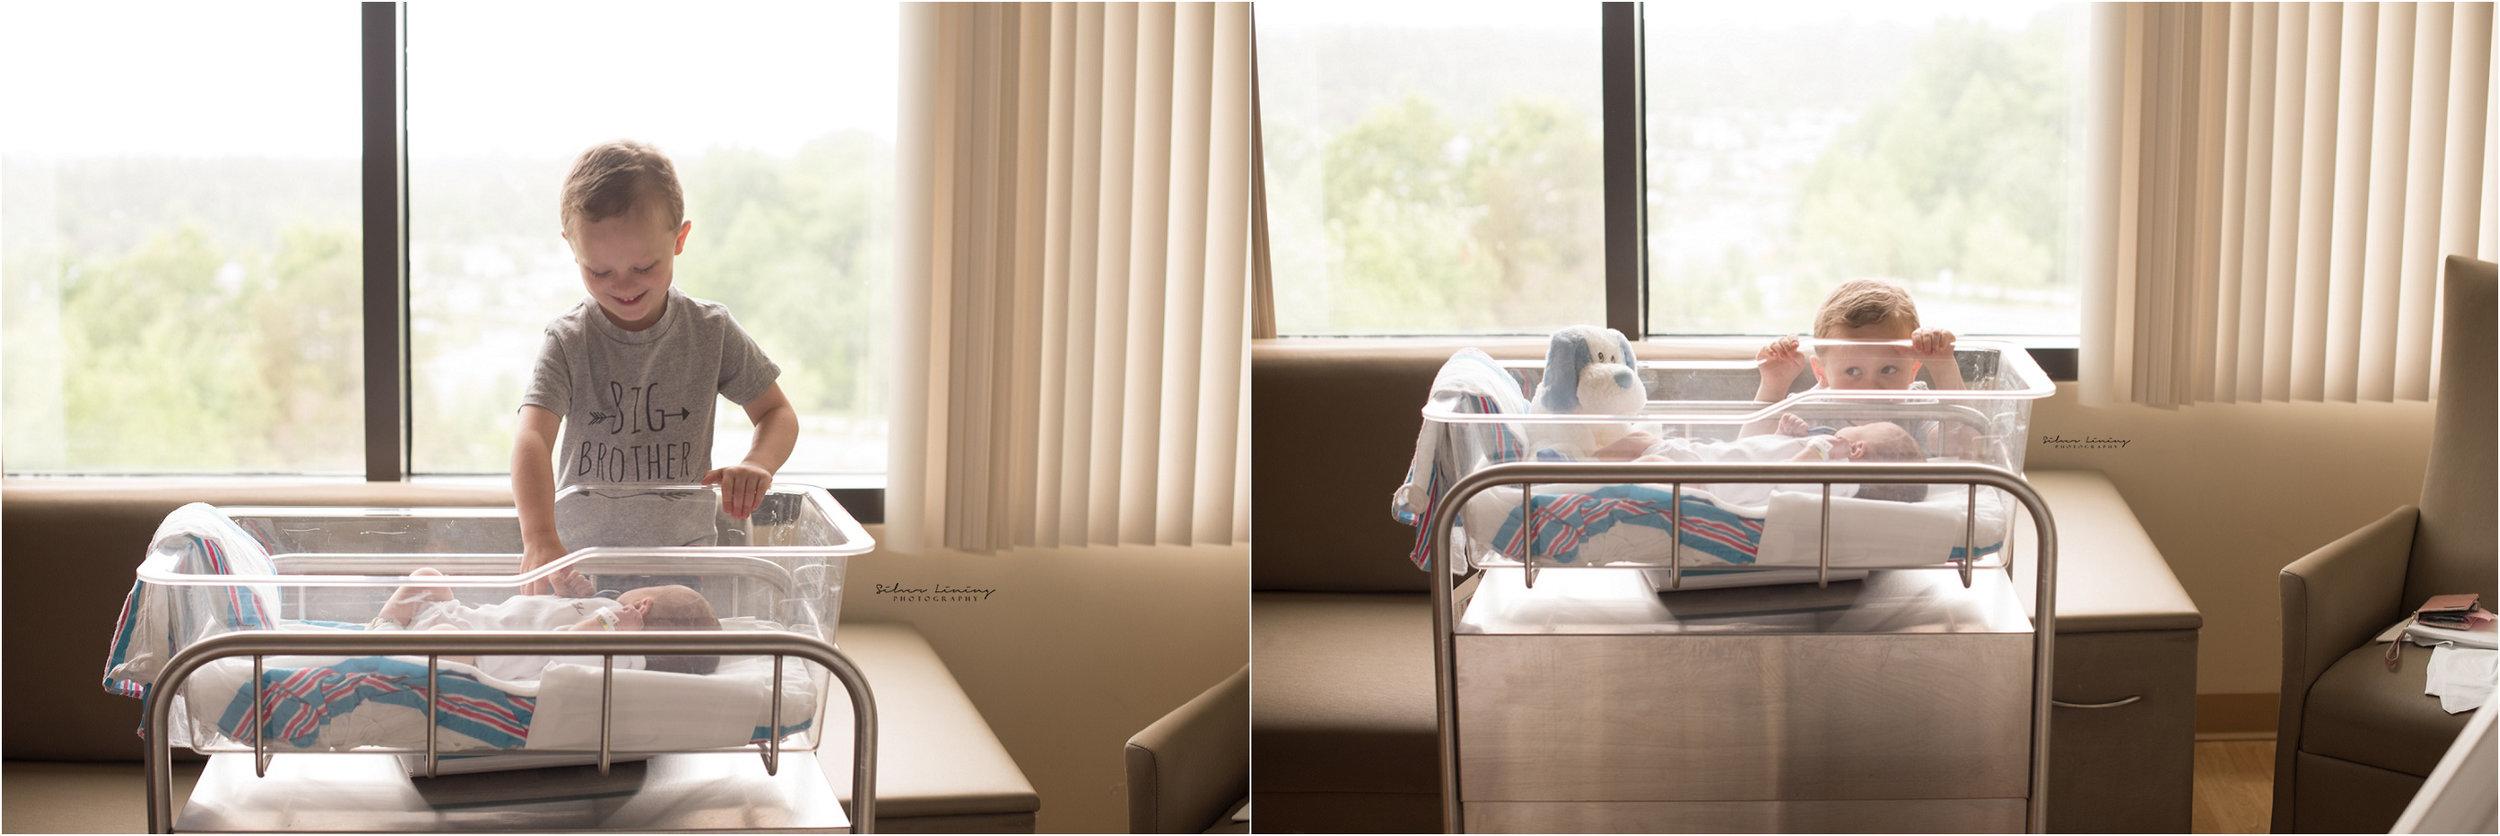 Virtua Voorhees Newborn photos (6).jpg